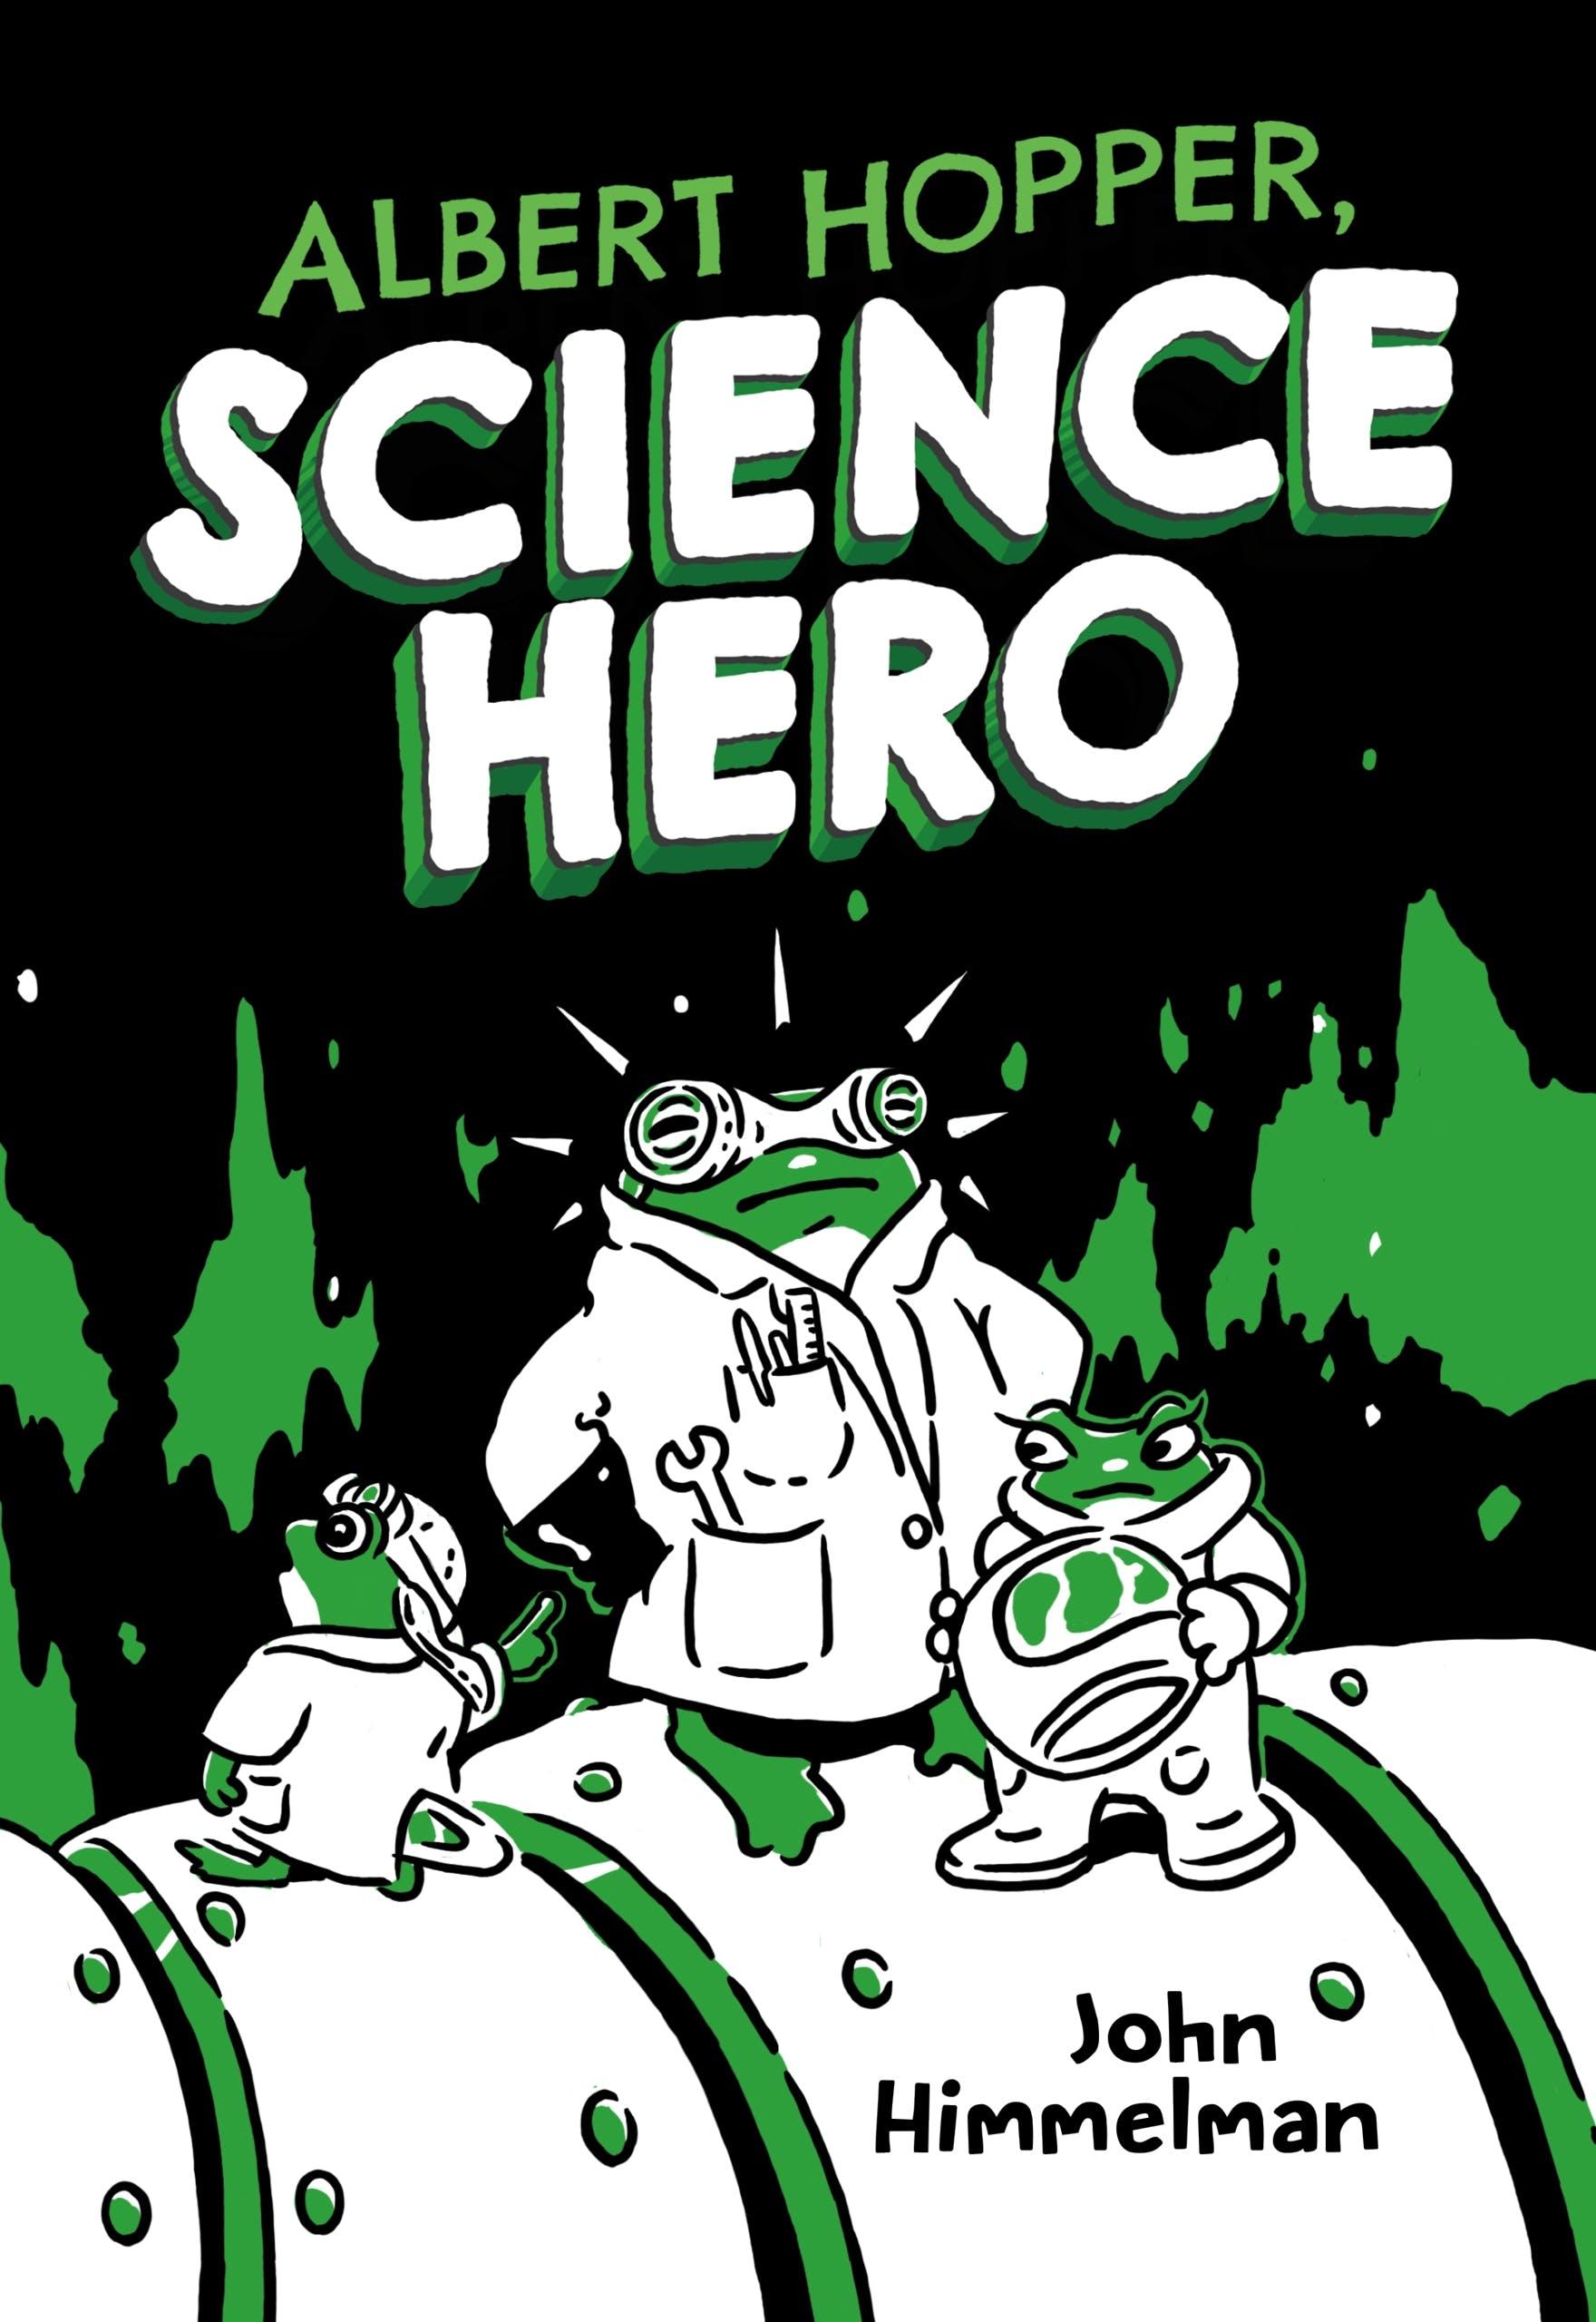 Image of Albert Hopper, Science Hero